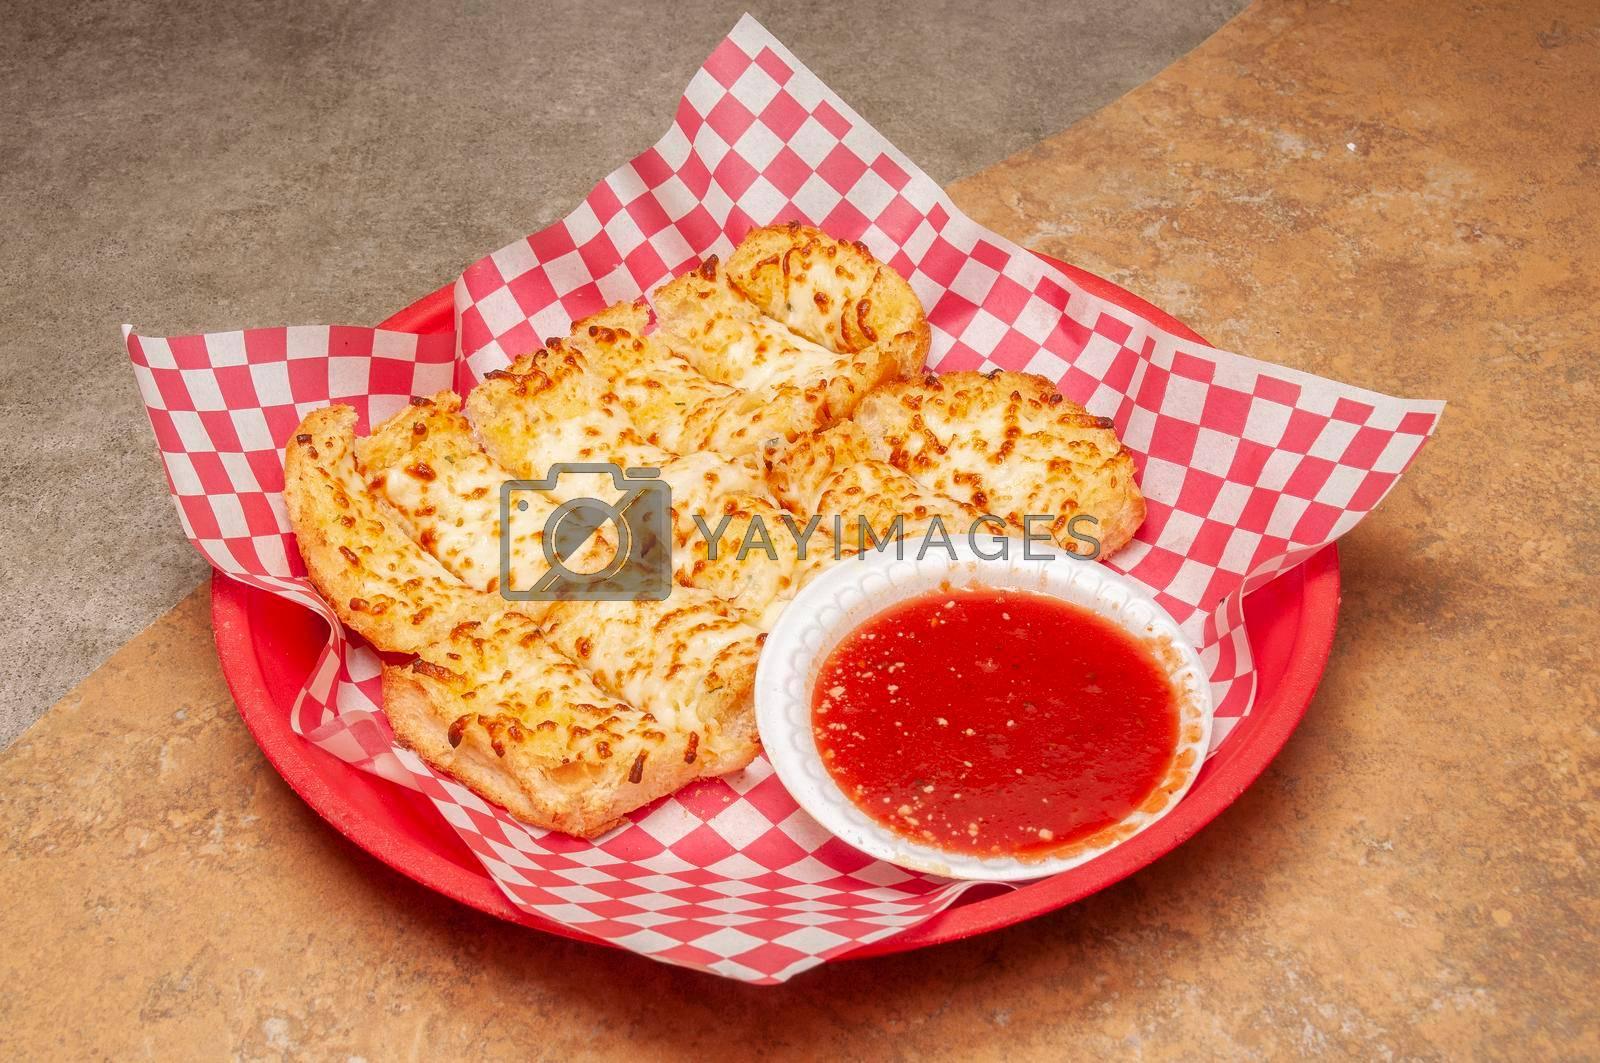 Authentic Italian cuisine known as garlic bread